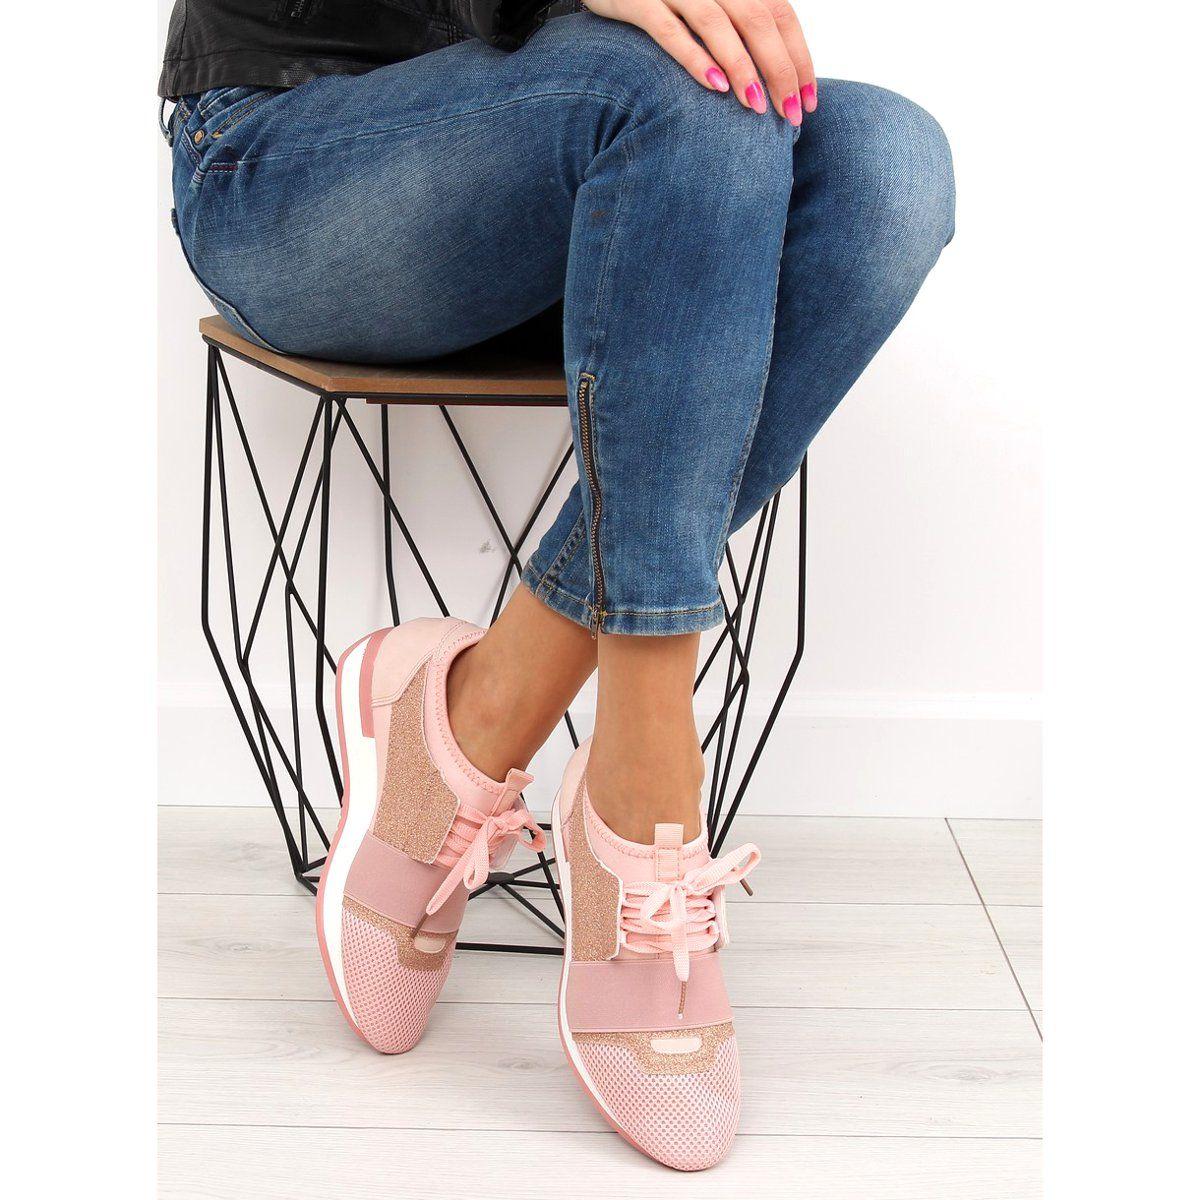 Buty Sportowe Rozowe K1x063 Pink Zolte Shoes Heels Fashion